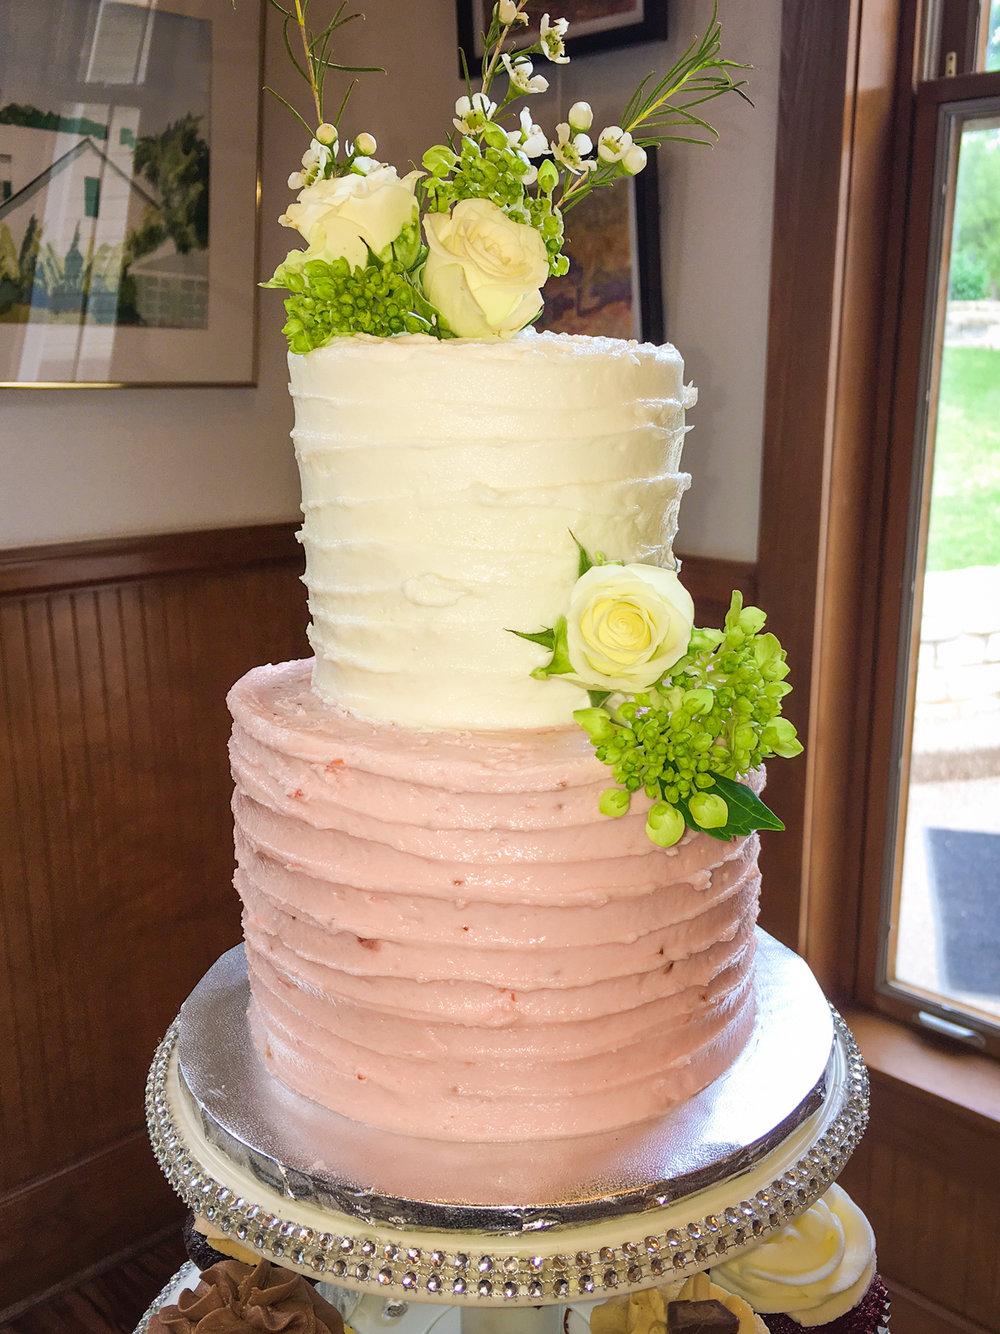 Wedding Cakes-31.jpg